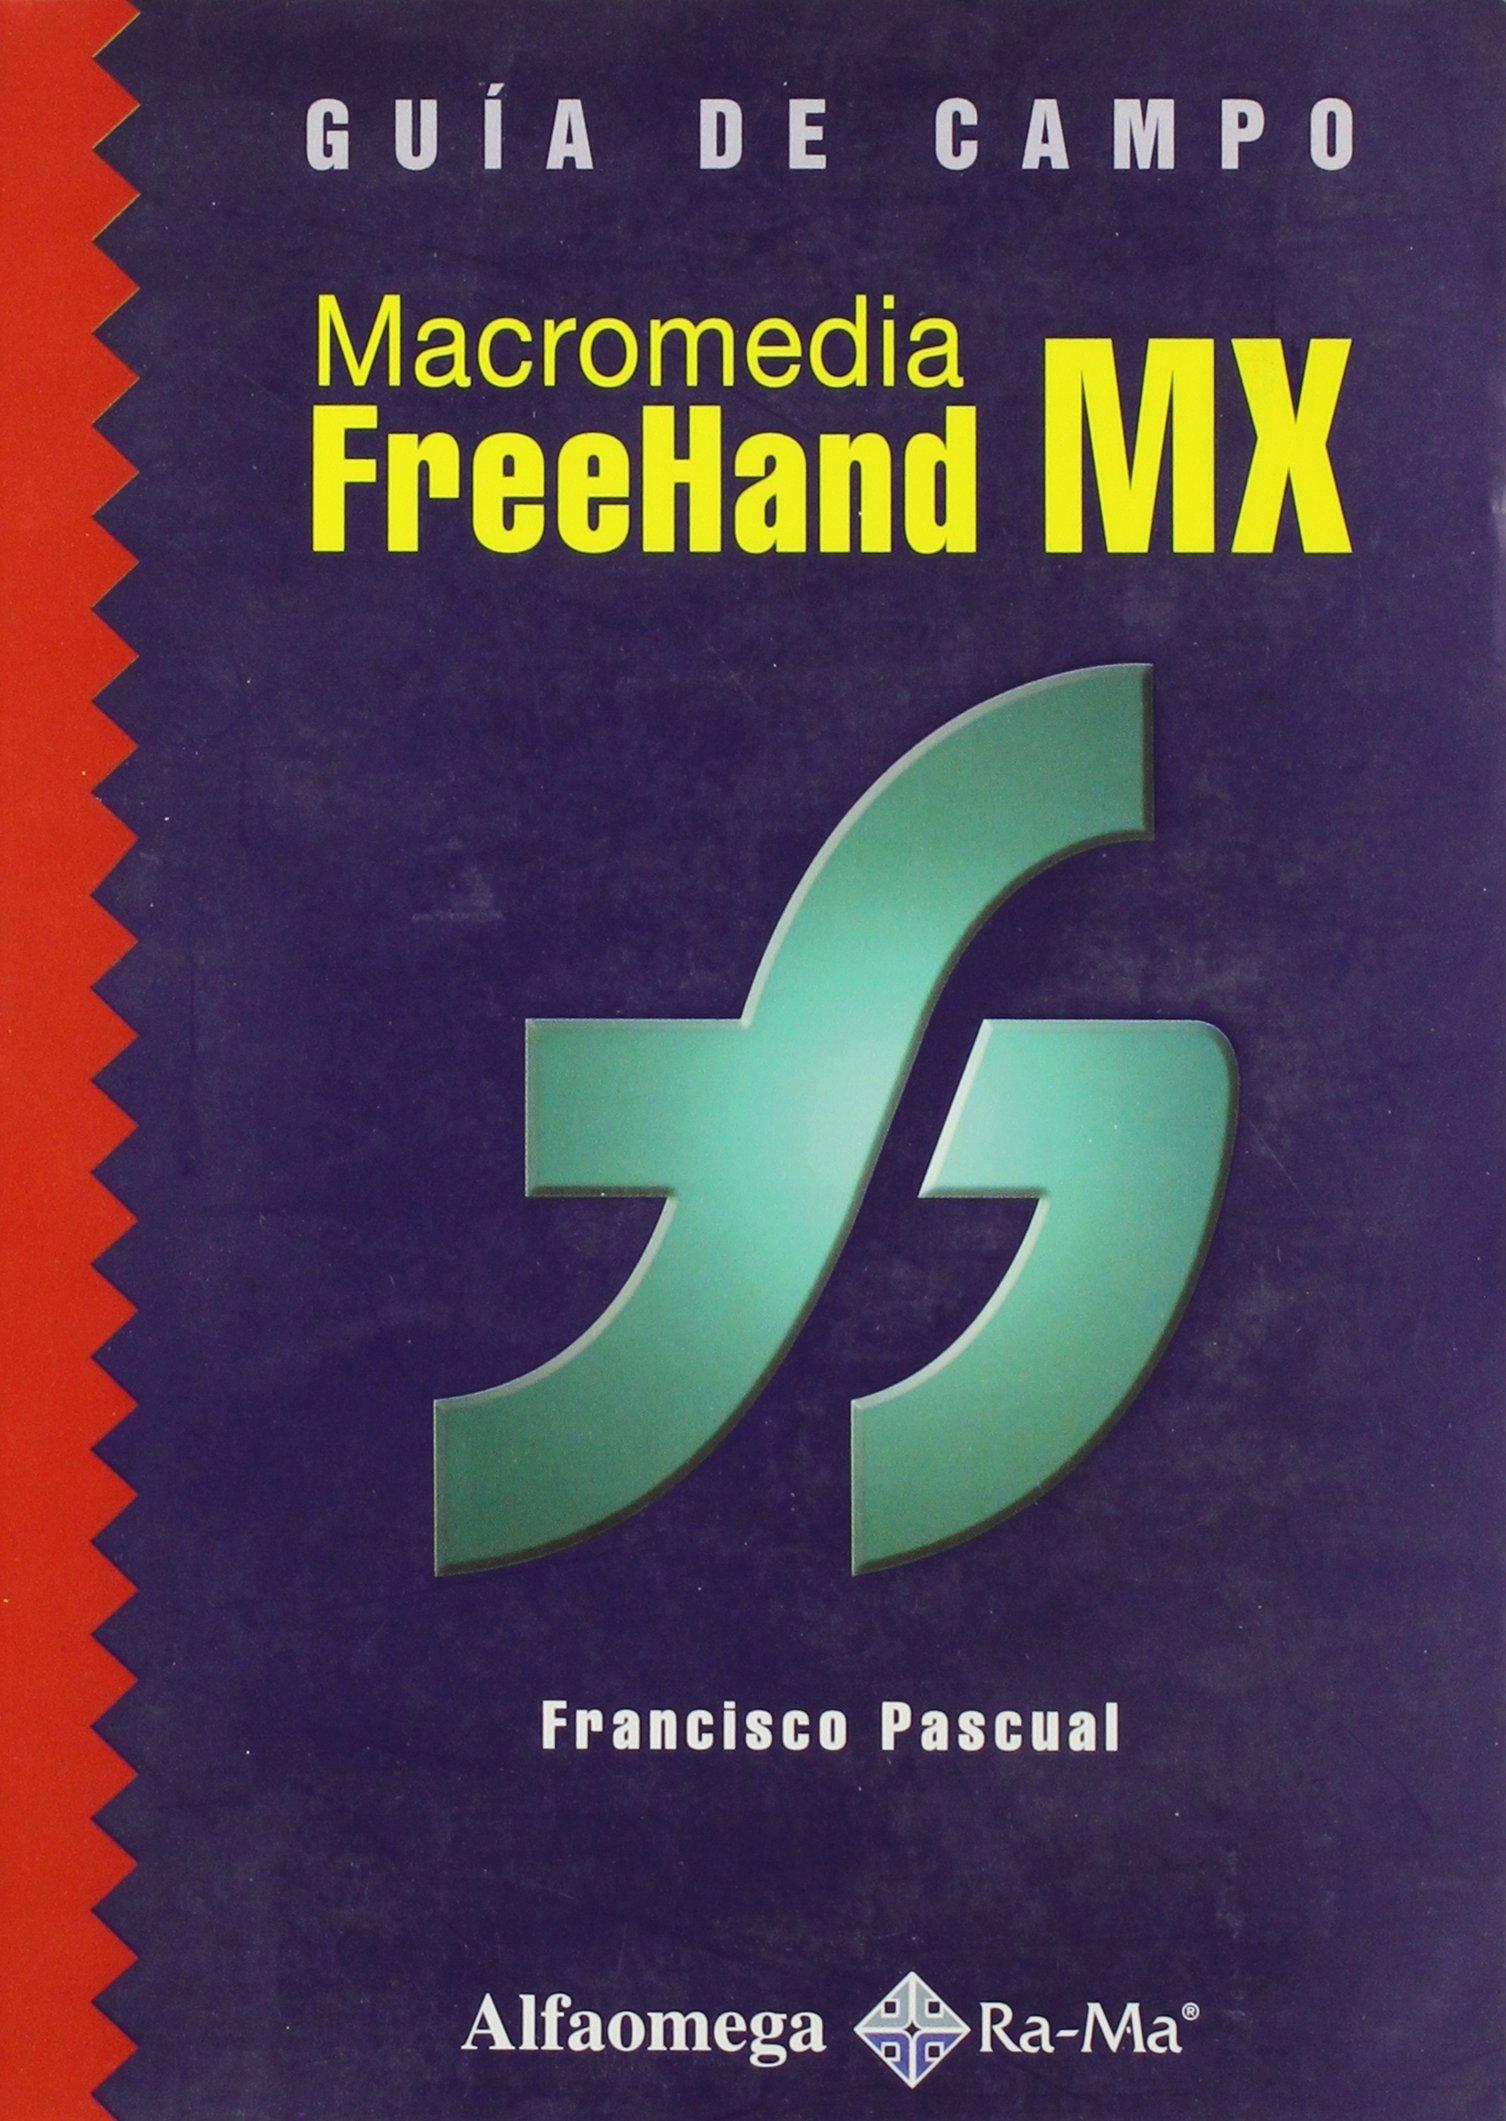 Macromedia FreeHand MX Guia de Campo (Spanish Edition) pdf epub